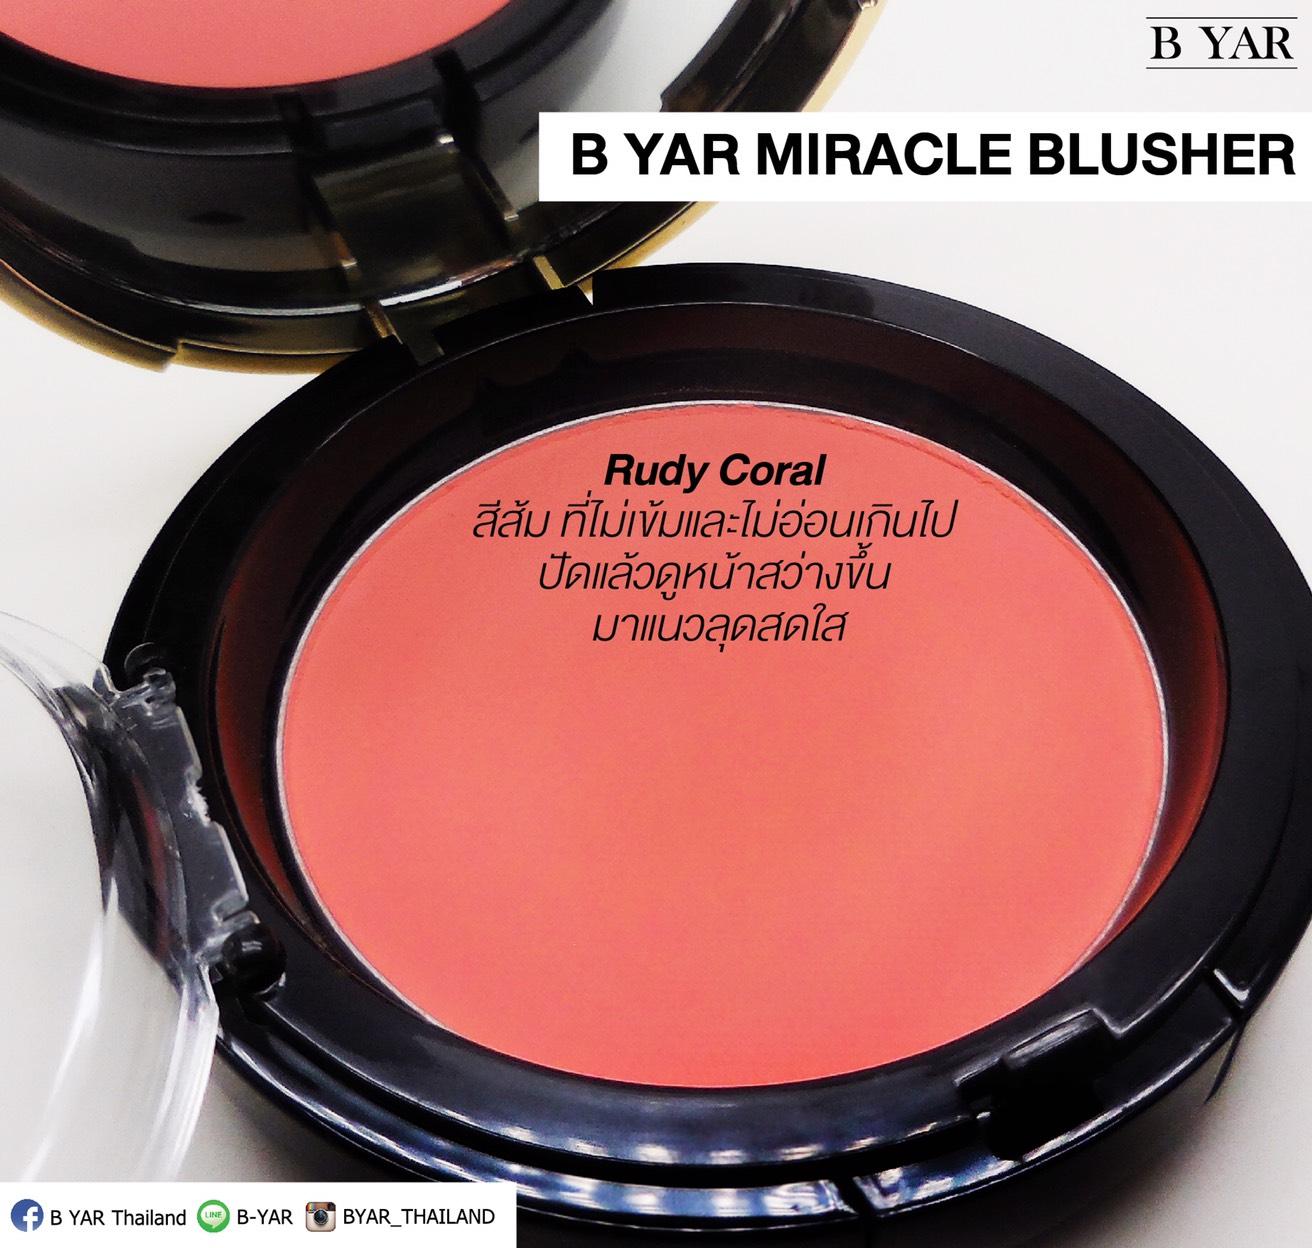 B YAR Miracle Blusher #Rudy Coral